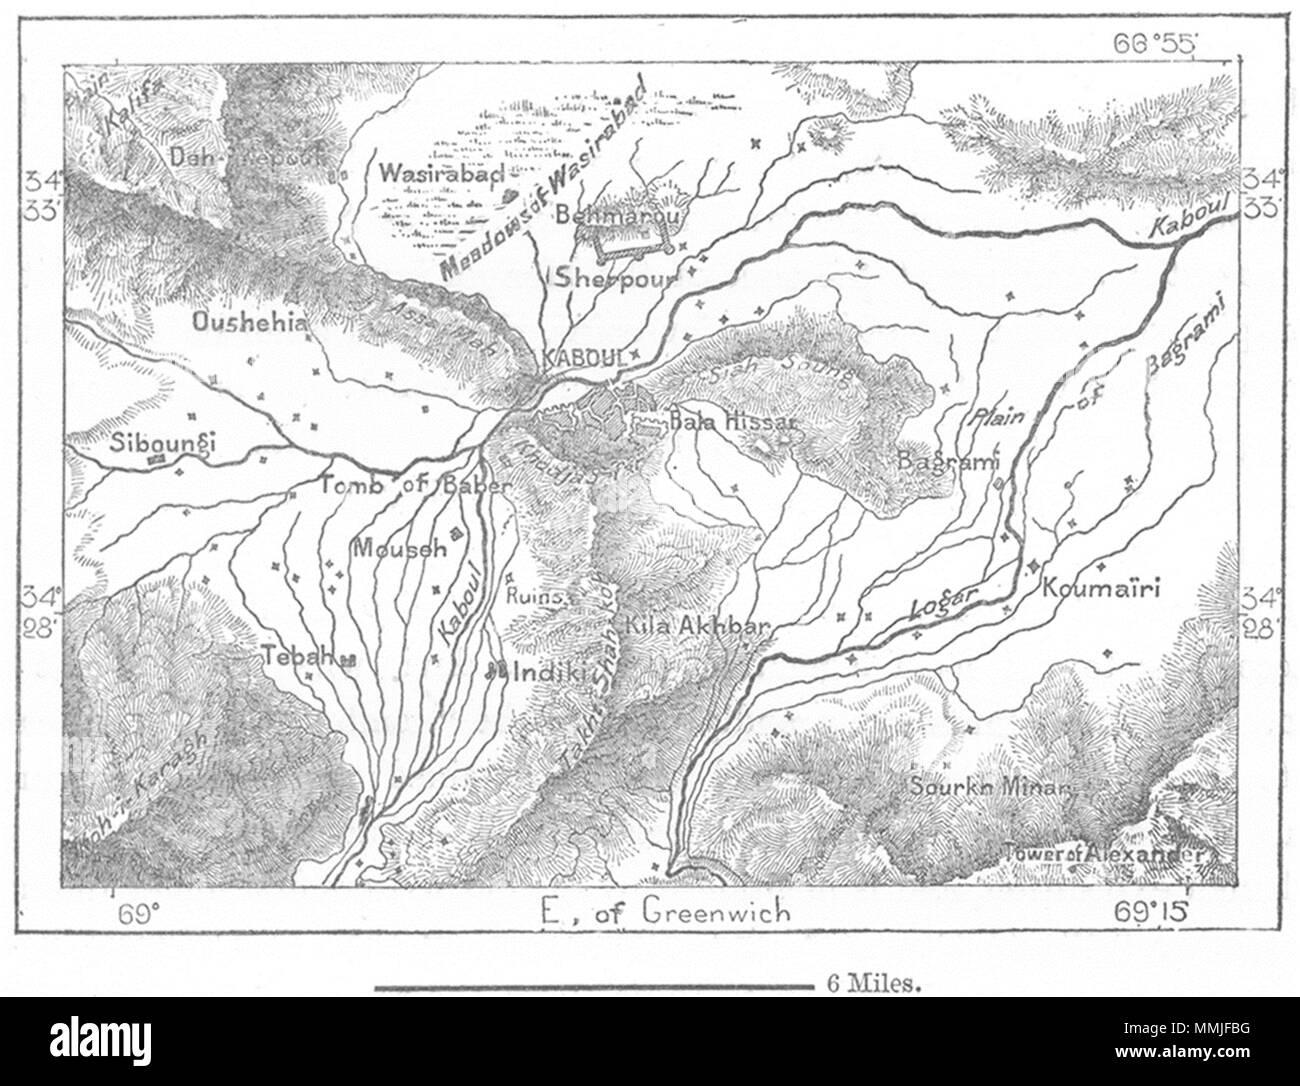 Kabul Map Stock Photos & Kabul Map Stock Images - Alamy on karachi map, ghazni province, mazar-e sharif, bagram air base map, wardak province, sarajevo map, kandahar map, kapisa province, muscat map, laghman province, afghanistan map, badakhshan province, kunar province, paktia province, paktika province, peshawar map, tehran map, nangarhar province, khyber pass map, kathmandu map, kabul university, panjshir province, medina map, kandahar province, herat province, balkh province, kunduz province, beirut map, mauryan empire map, helmand province, khartoum map, dhaka map, ghazni map, istanbul map, casablanca map, bogota map, kigali map,